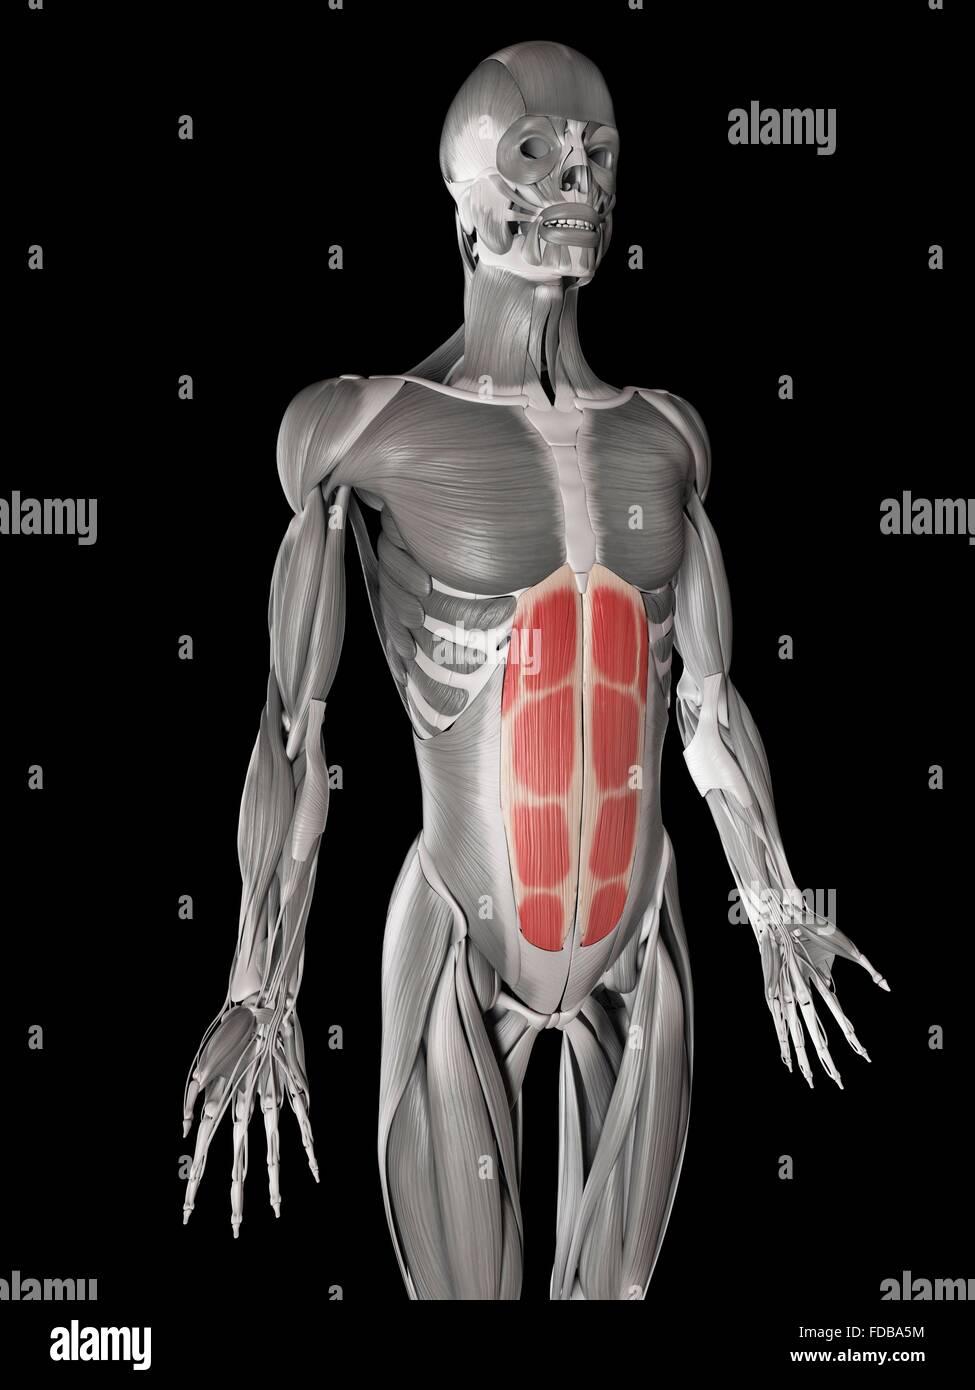 Human Abdominal Muscles Rectus Abdominis Illustration Stock Photo